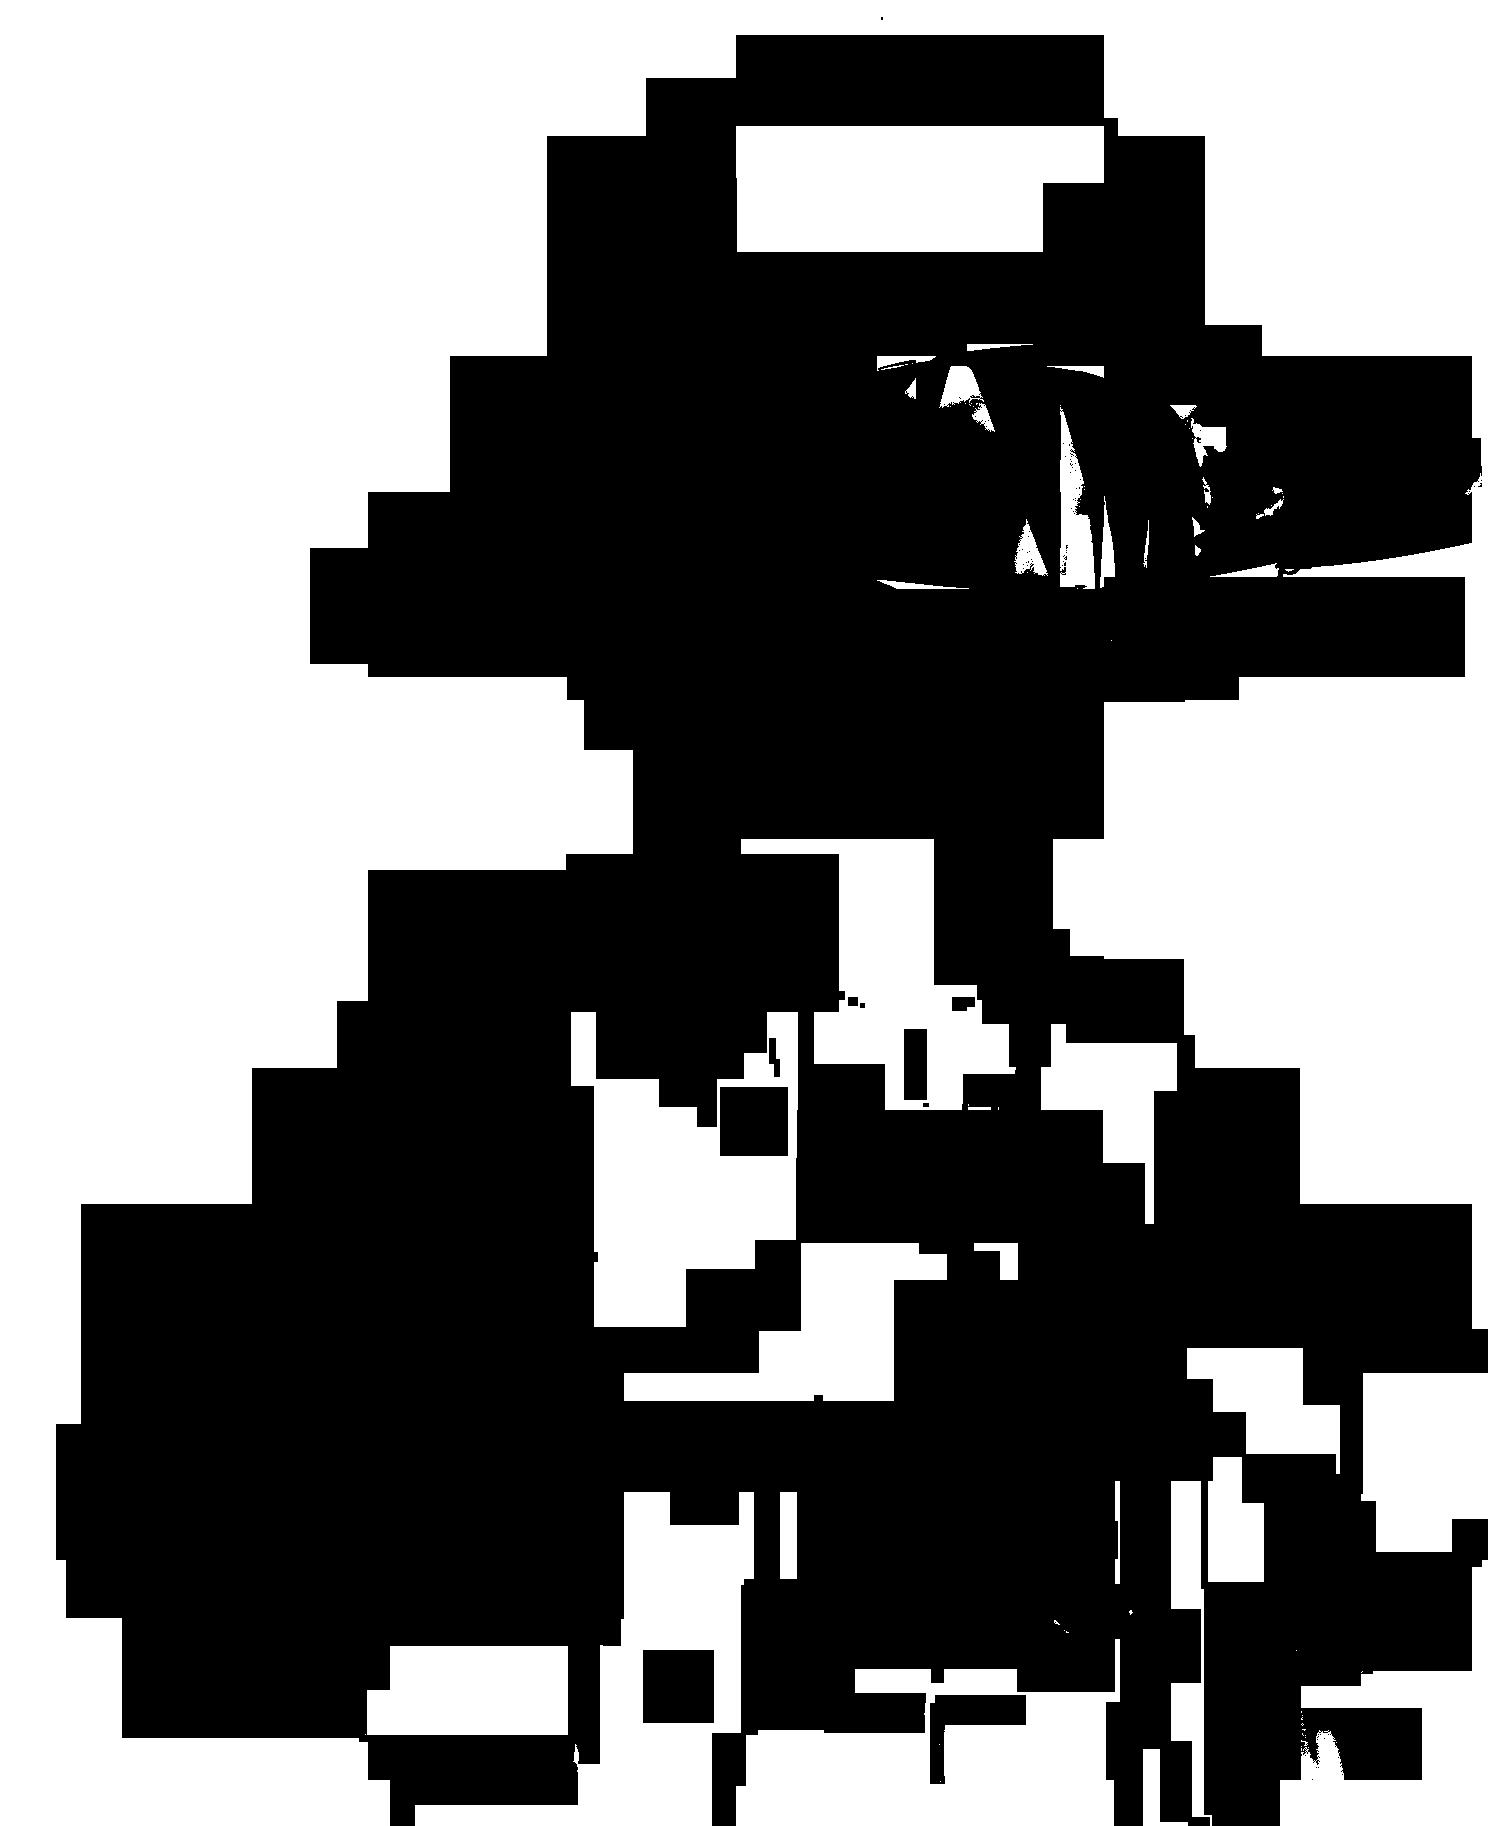 Luffy 2Y Lineart by Zodyack on DeviantArt